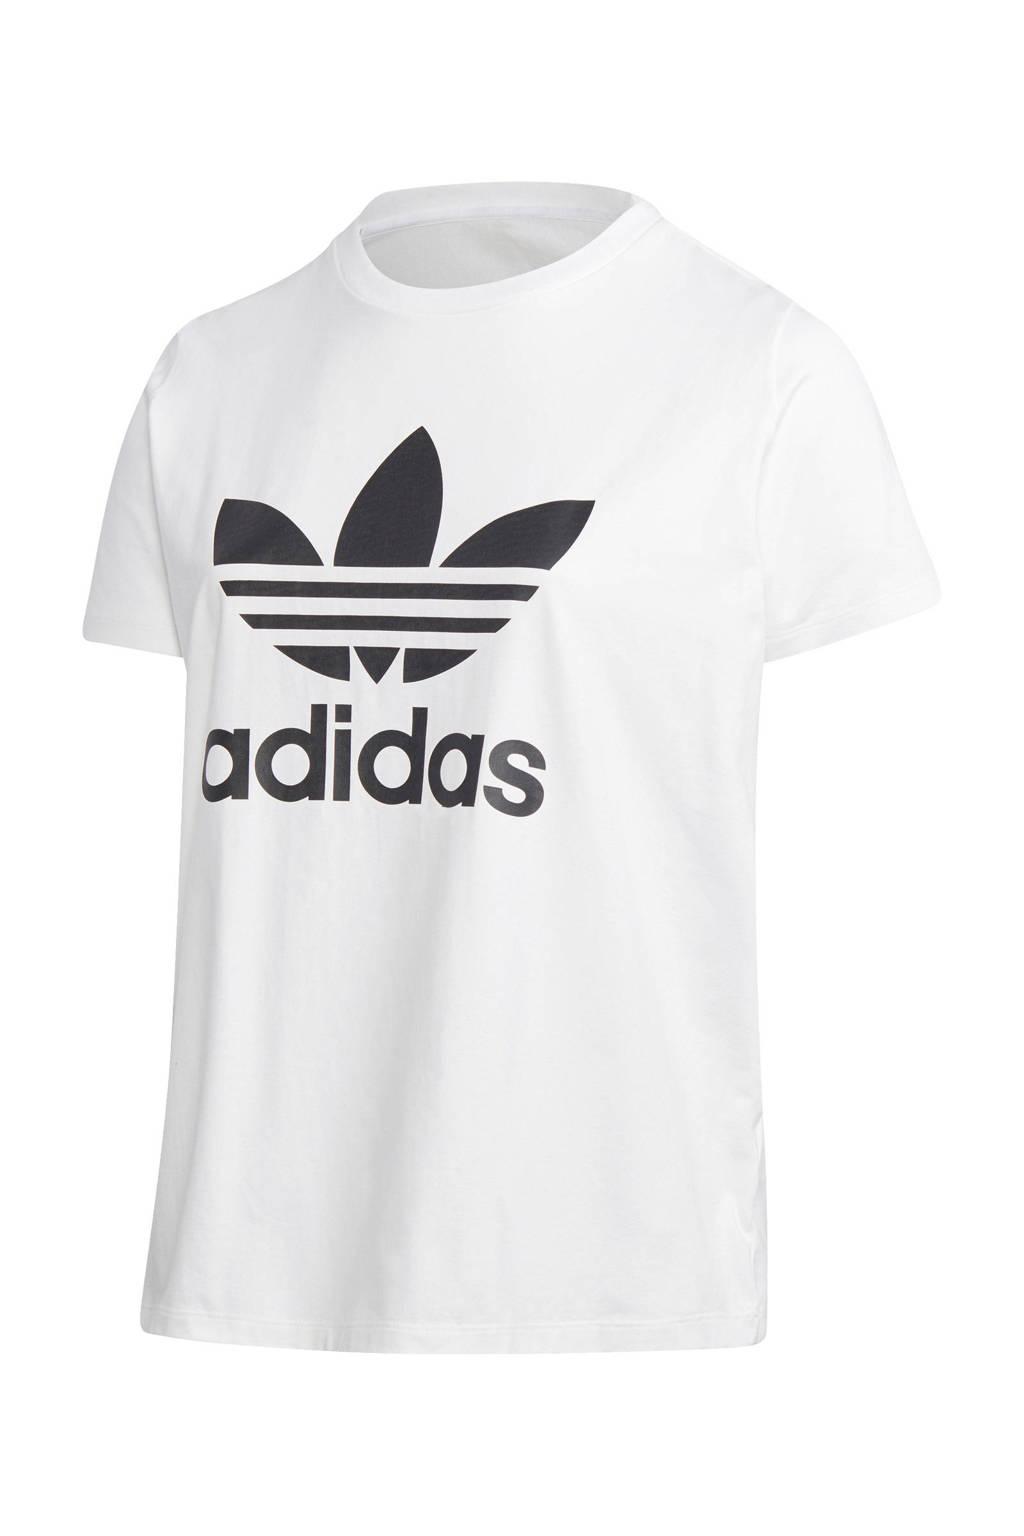 adidas Originals T-shirt wit, Wit